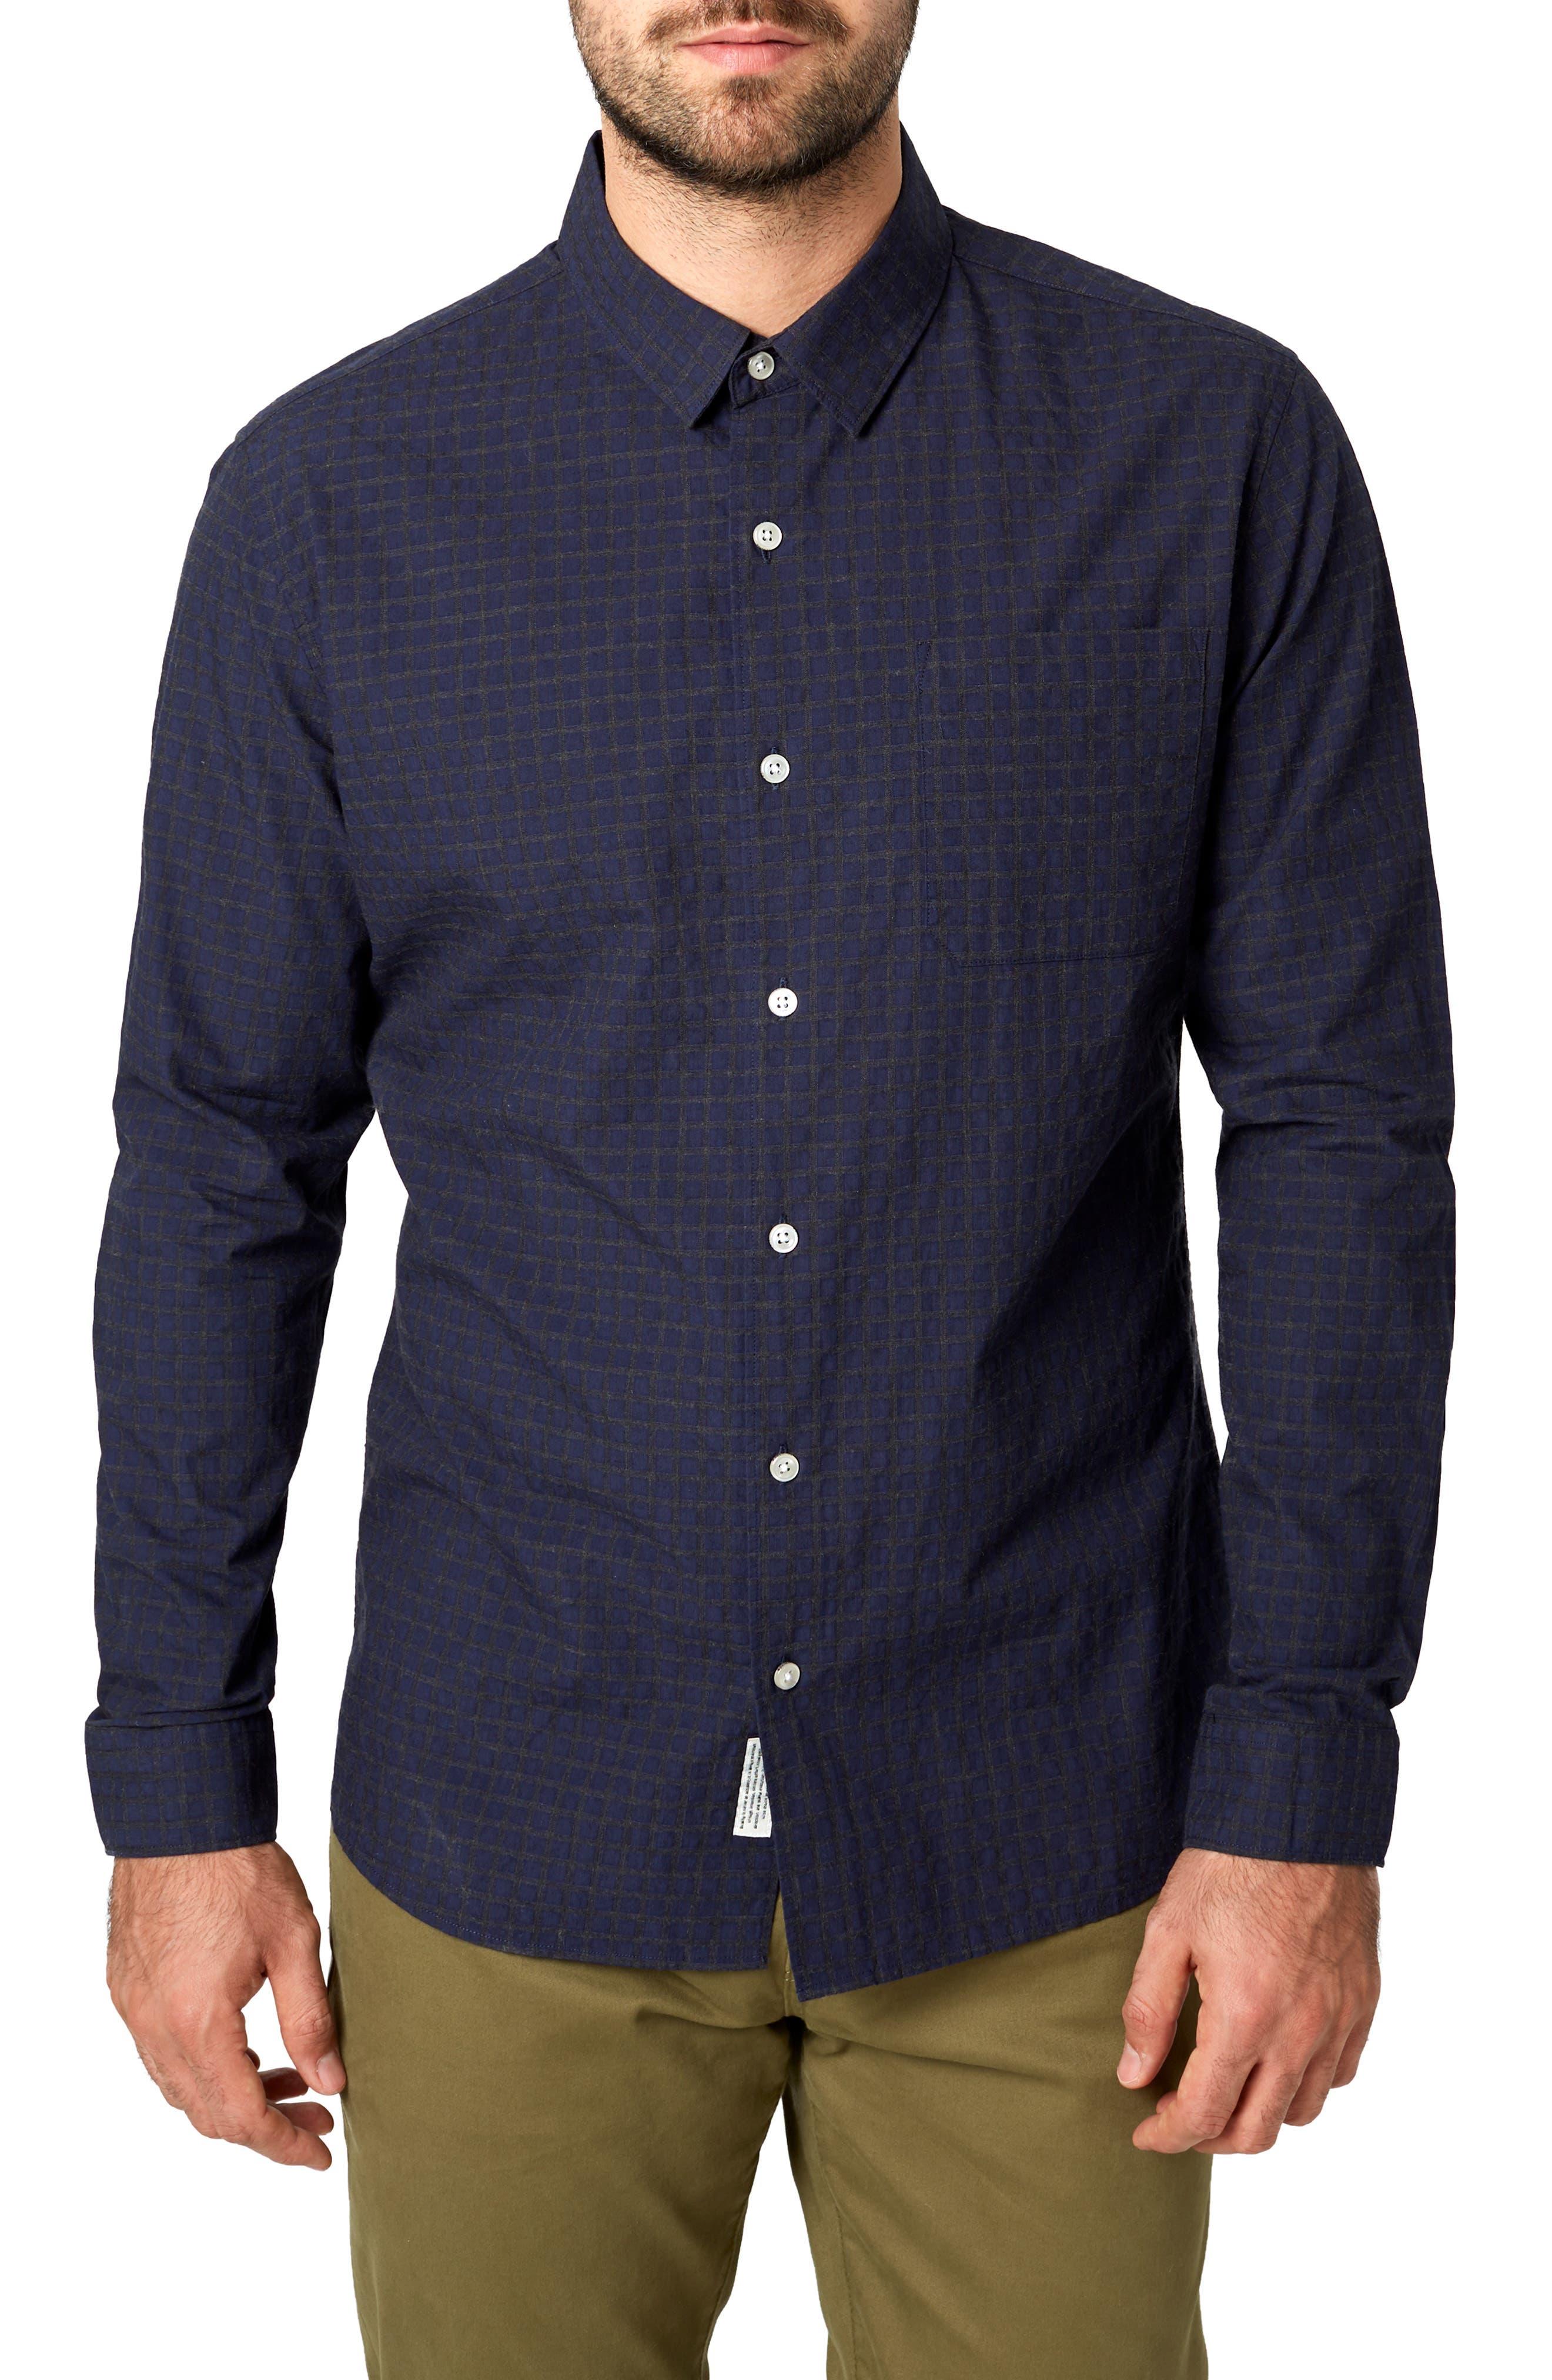 Players Club Trim Fit Linen Blend Sport Shirt,                             Main thumbnail 1, color,                             MIDNIGHT